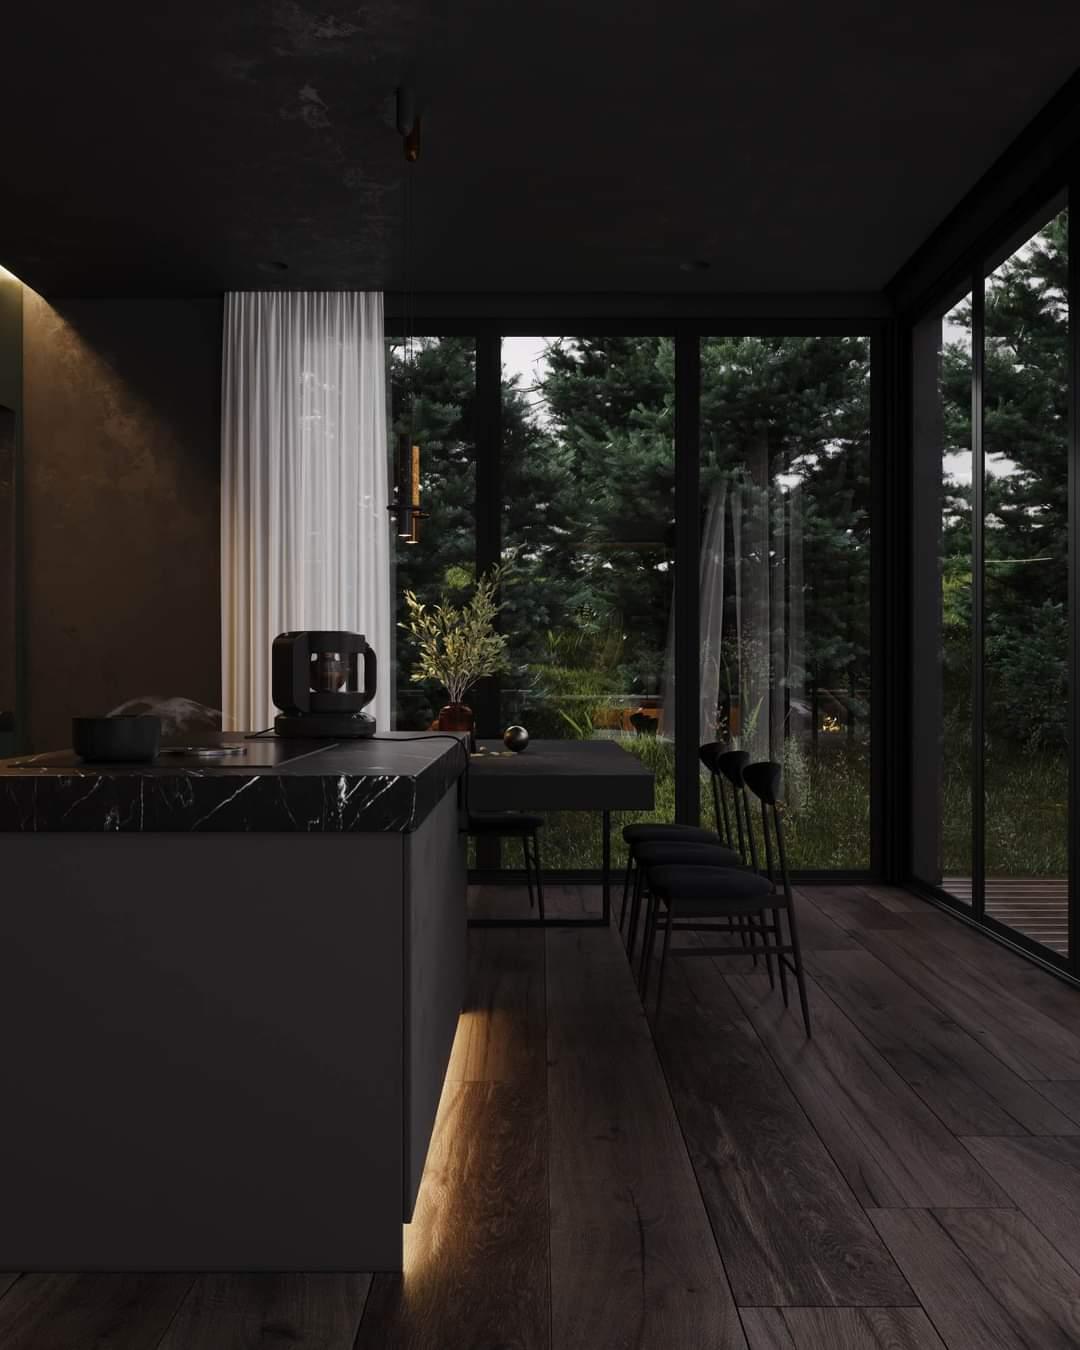 Beautiful Black Kitchen Design Set Up - Source: Kireevaaanna